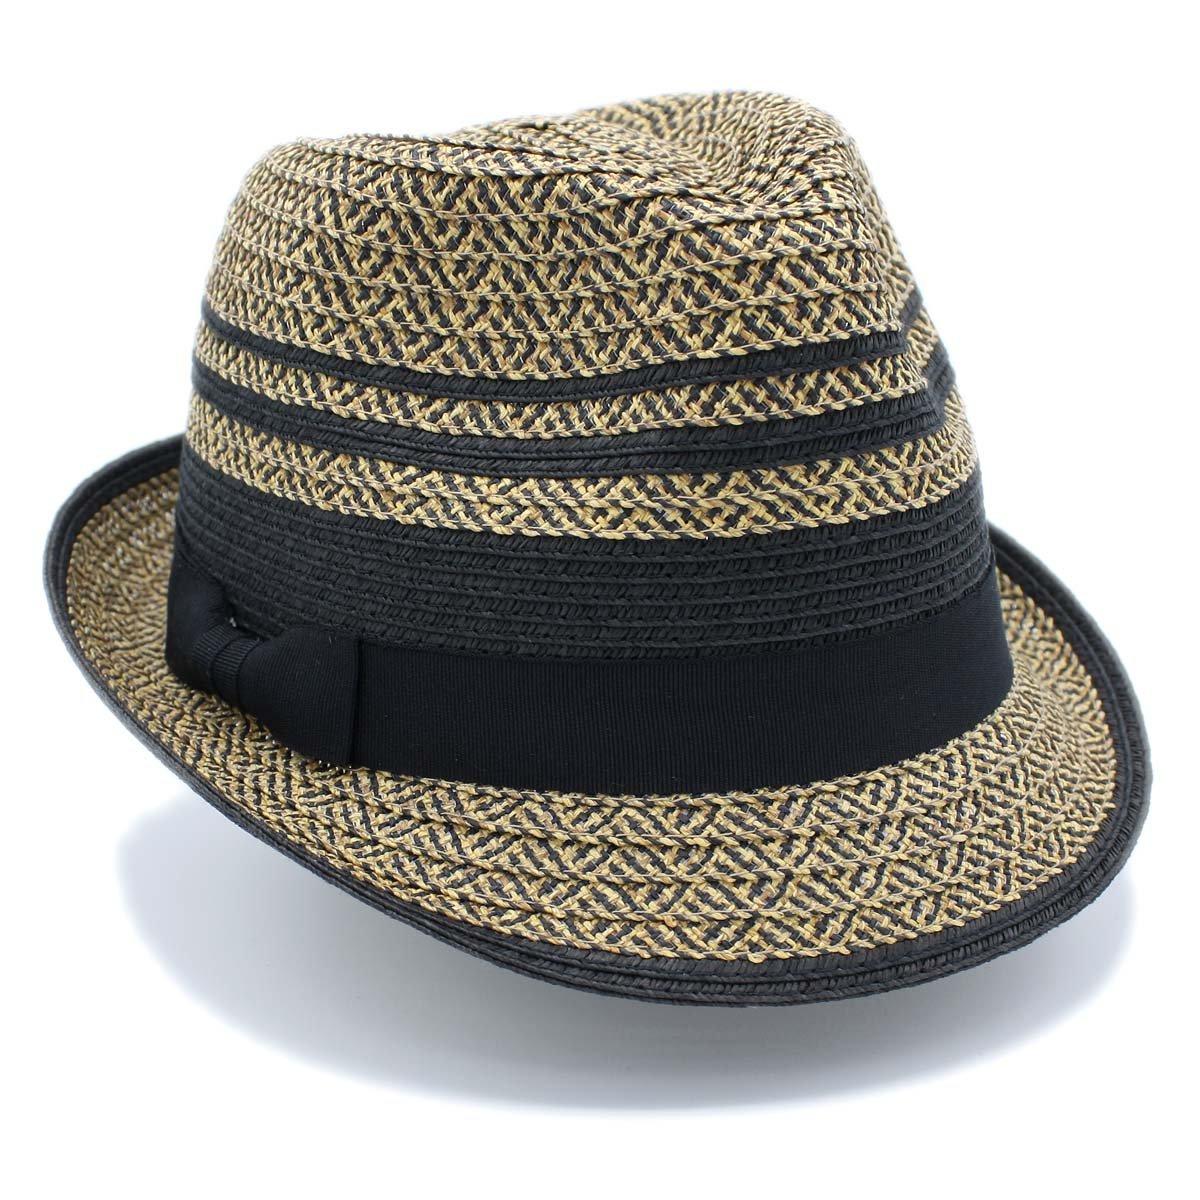 1 3/4'' Wide Brim Panama Roll Up Fedora Sun Hat Beach Cap With Band (A-Black)